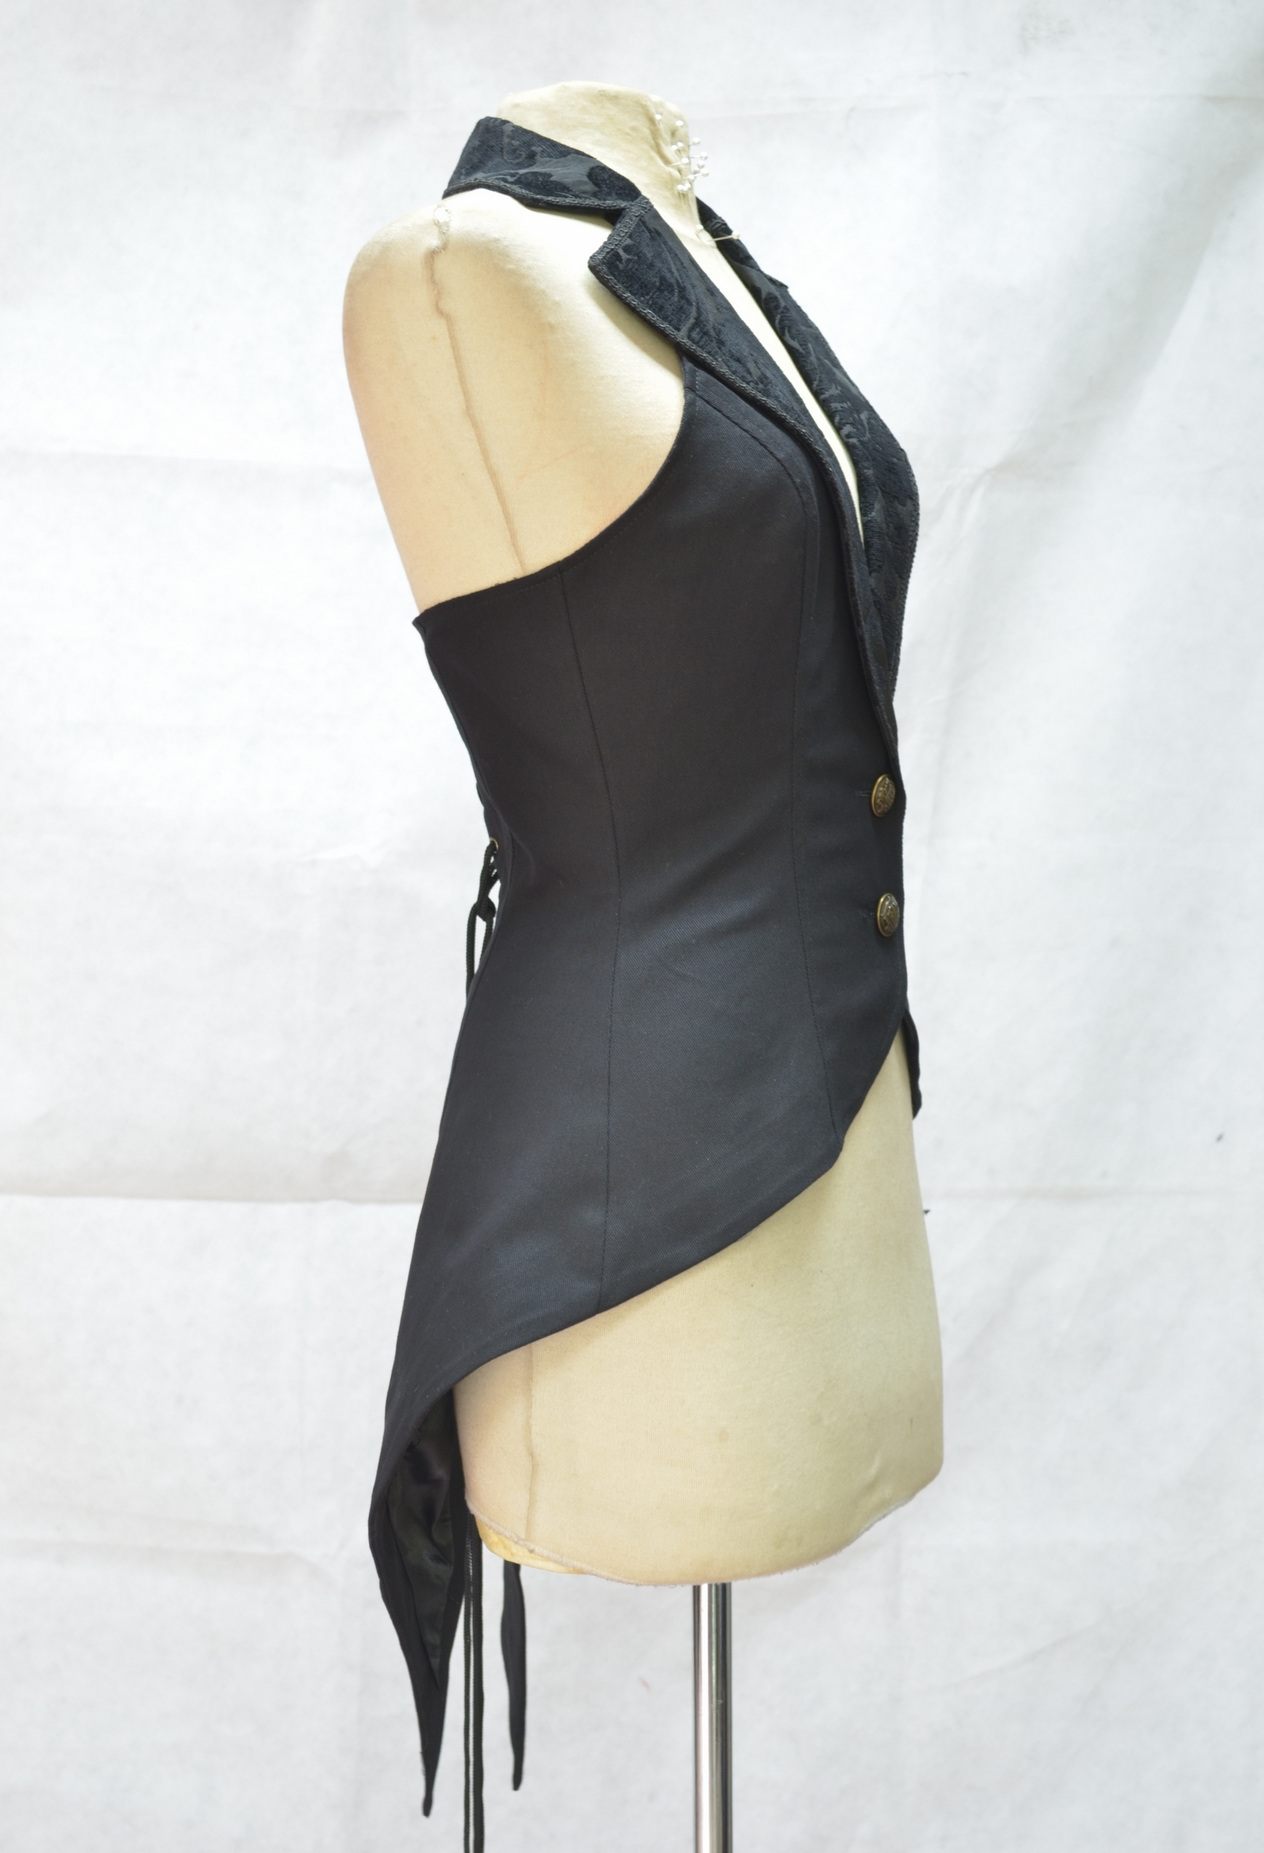 black_tailcoat_style_gothic_waistcoat_for_women_vests_4.jpg